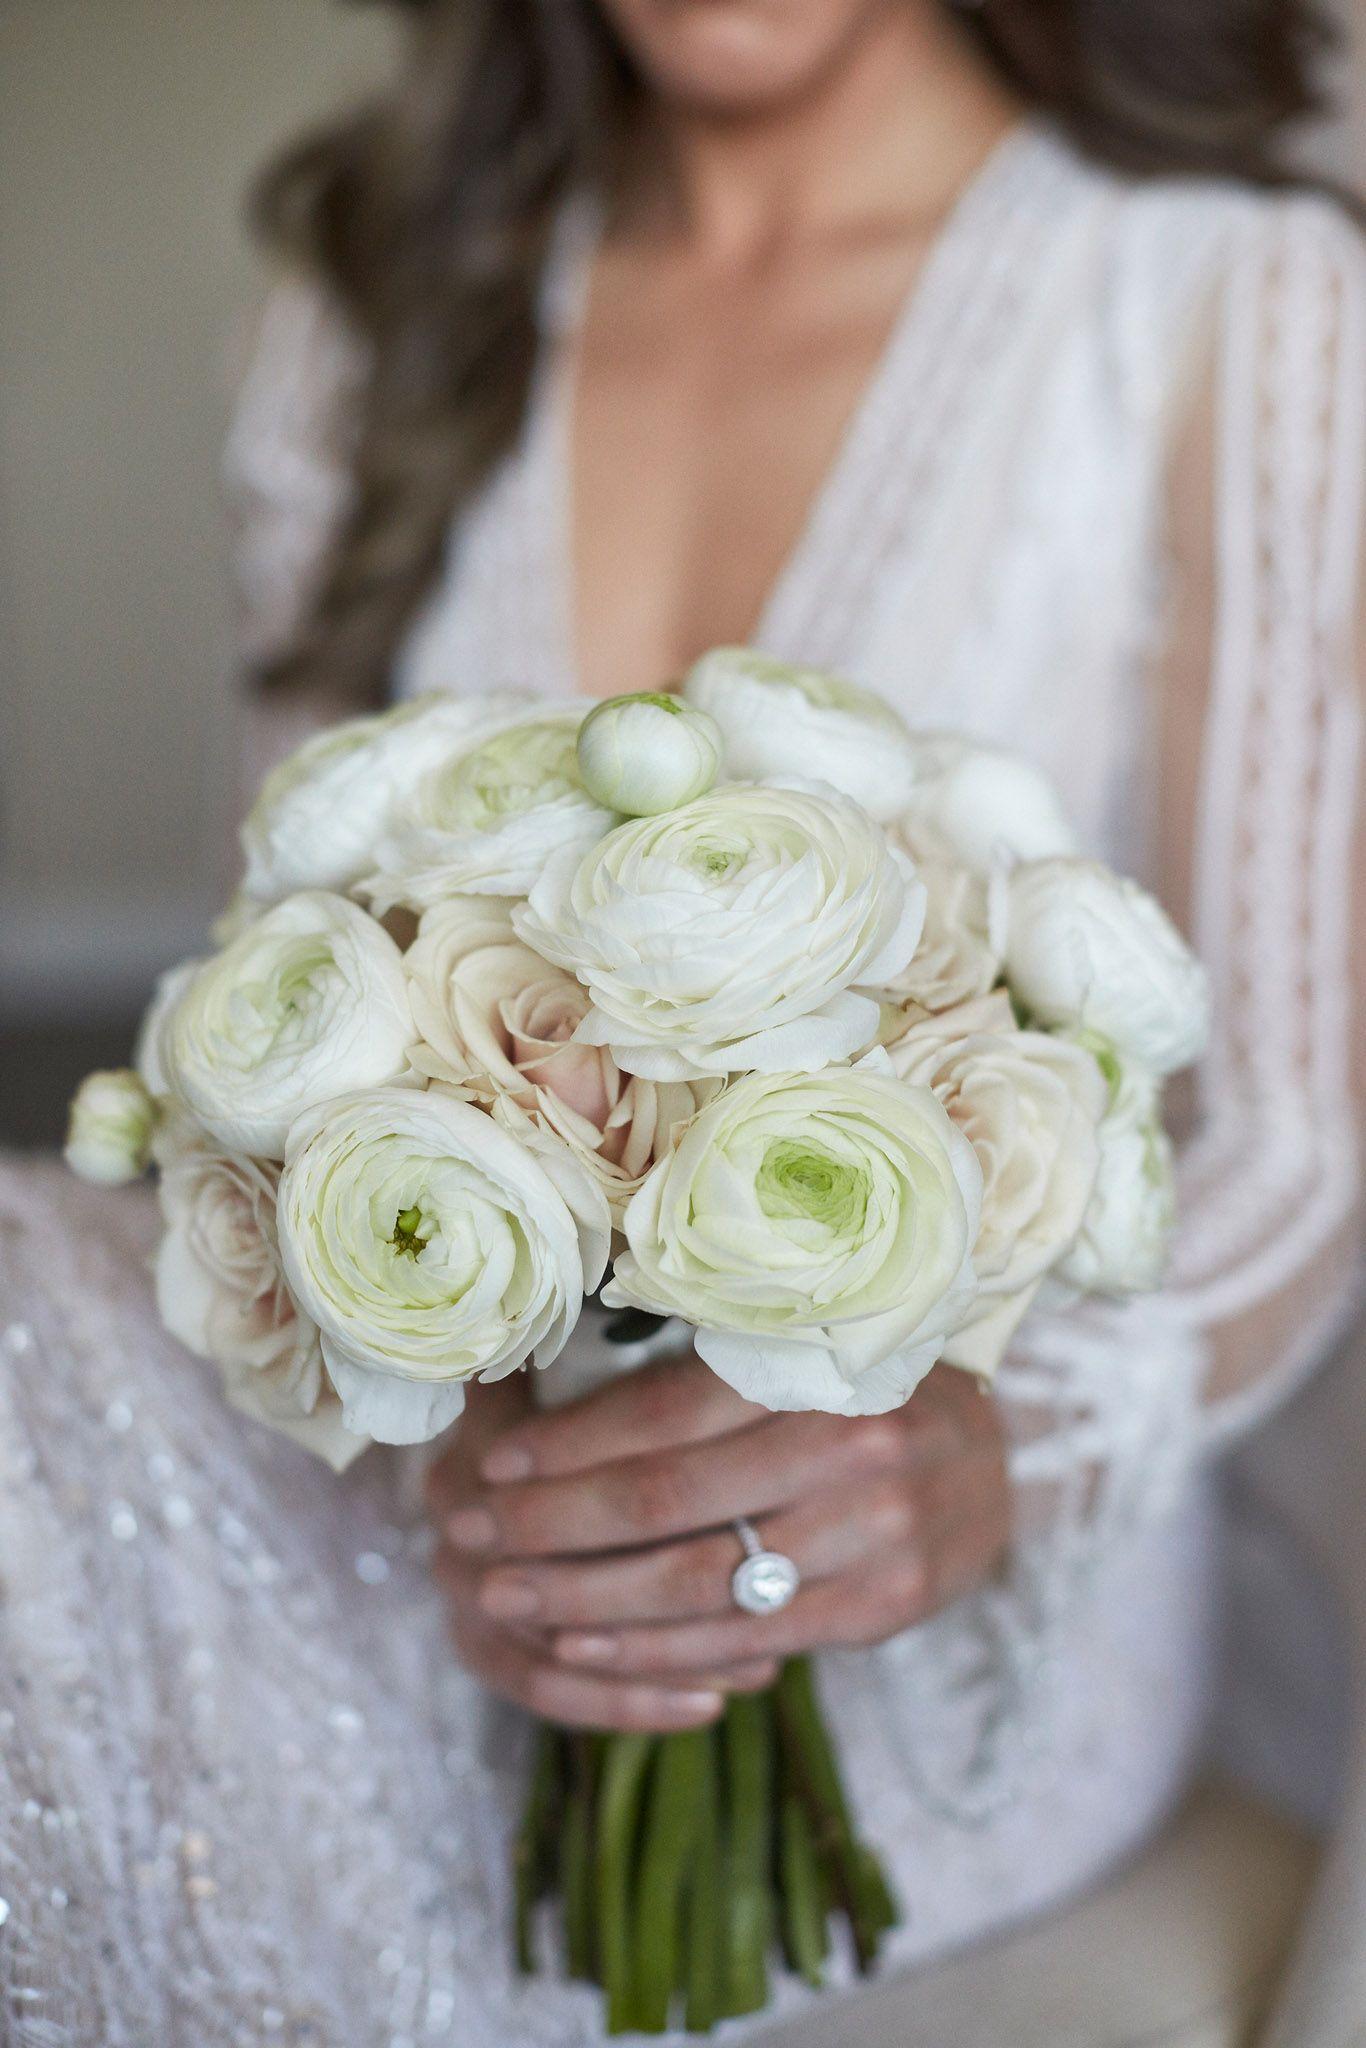 An Opulent Spring Wedding With Timeless Elegant Decor In Chicago Inside Weddings Ranunculus Bridal Bouquet White Bridal Bouquet Flower Bouquet Wedding